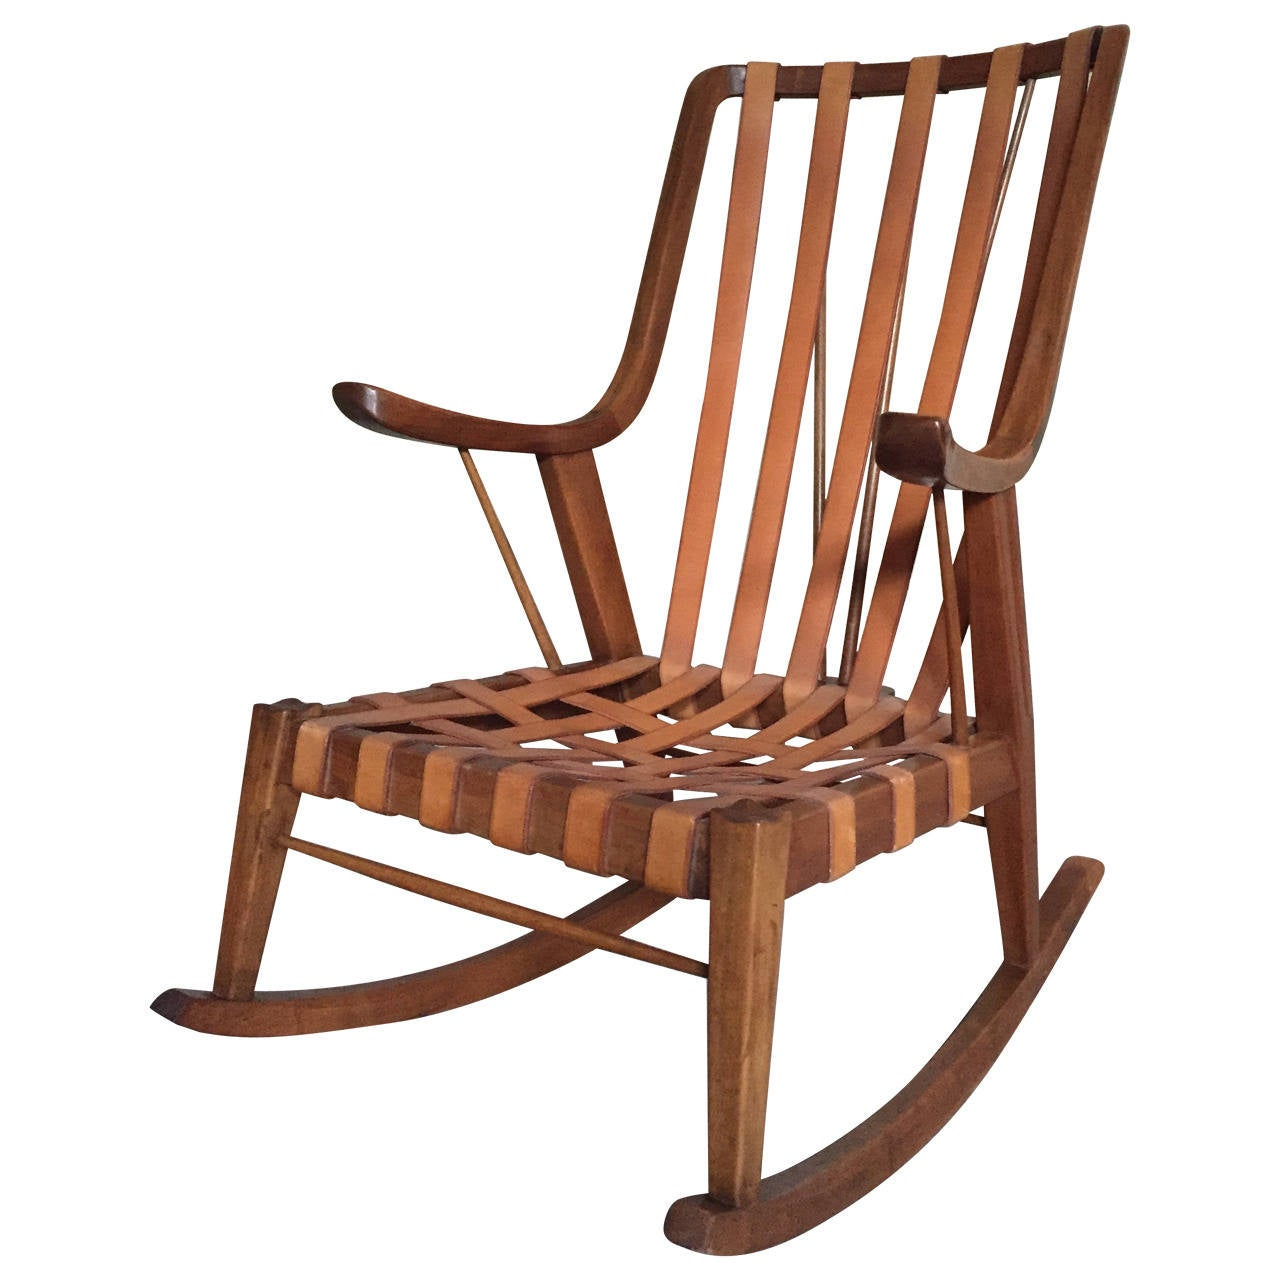 1960 Ercol Rocking Chair At 1stdibs